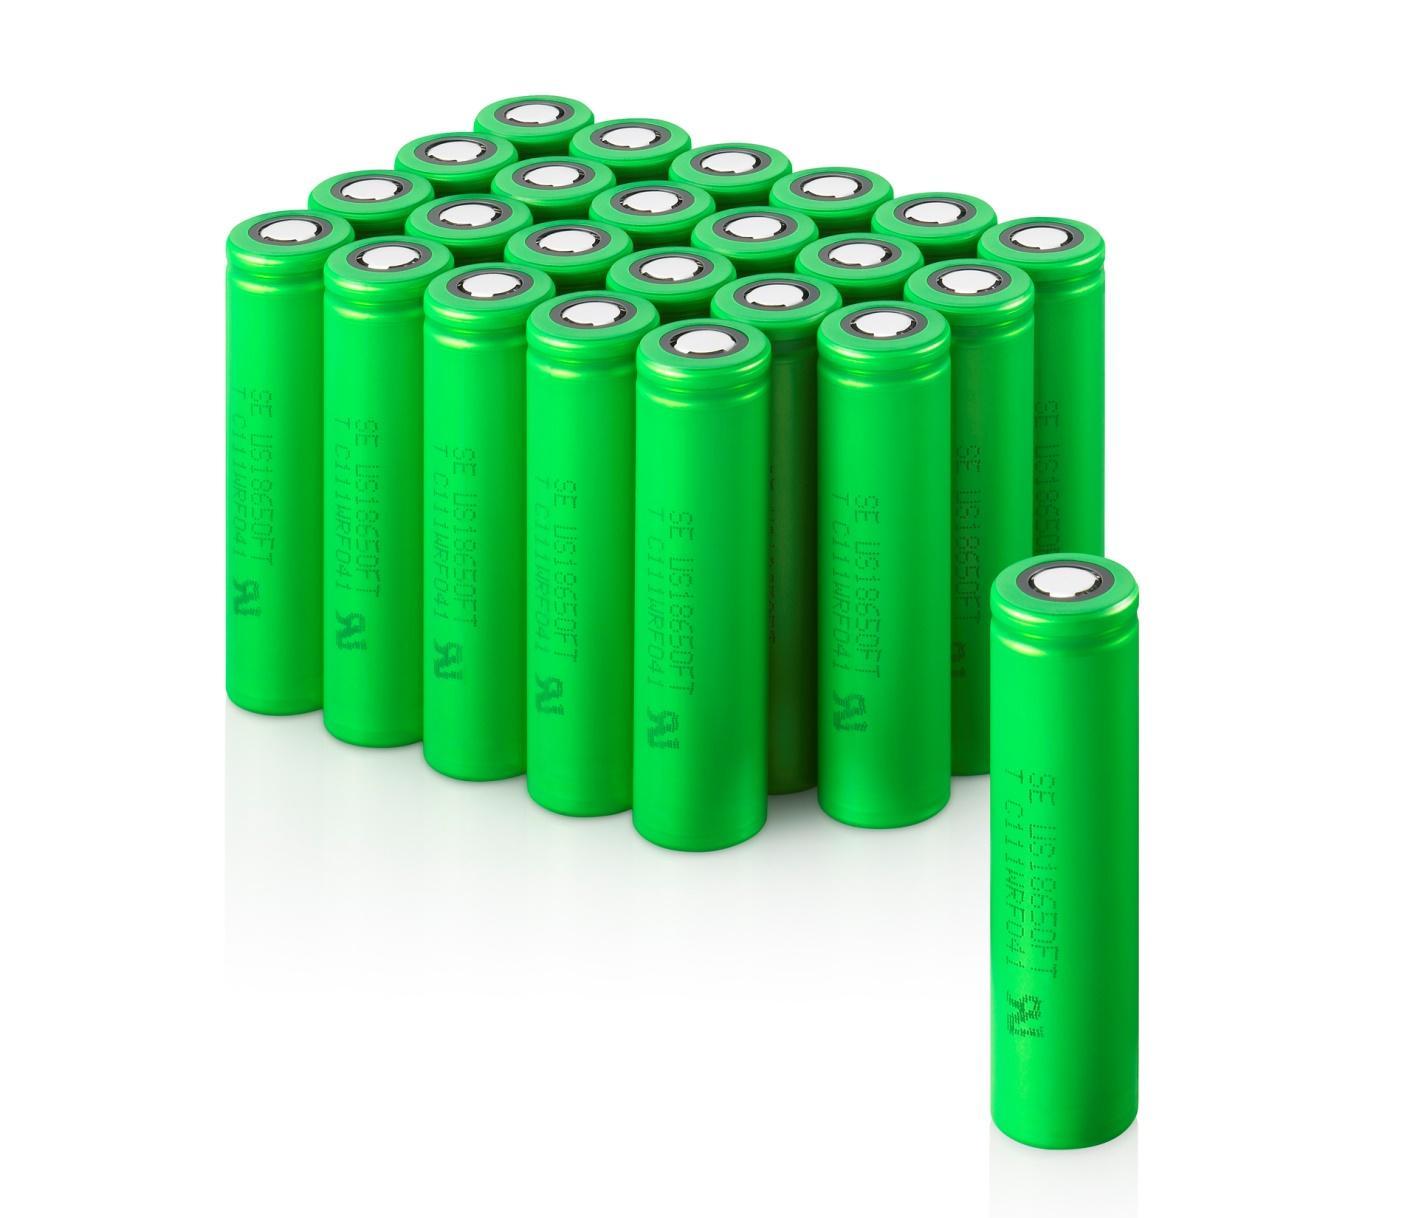 Смена аккумуляторов: ИБП на технологии Li-Ion - 1